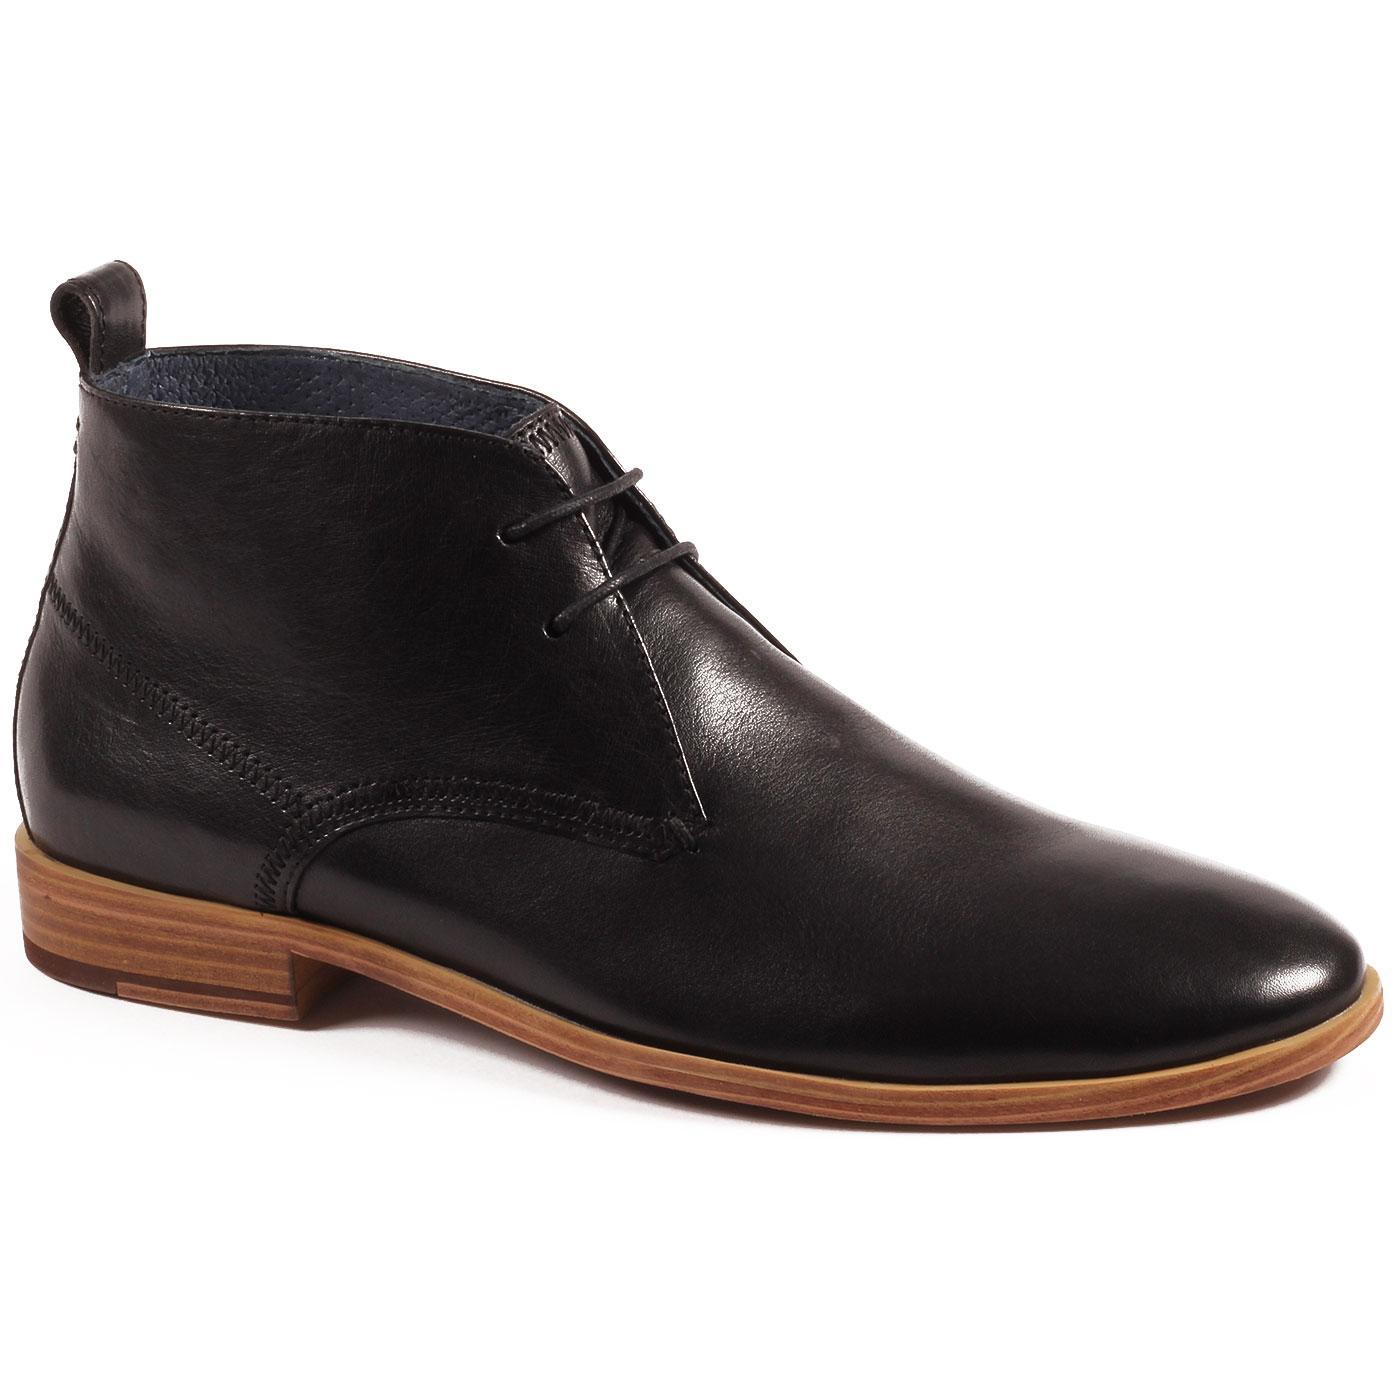 Player PAOLO VANDINI Mod Leather Chukka Boots (B)